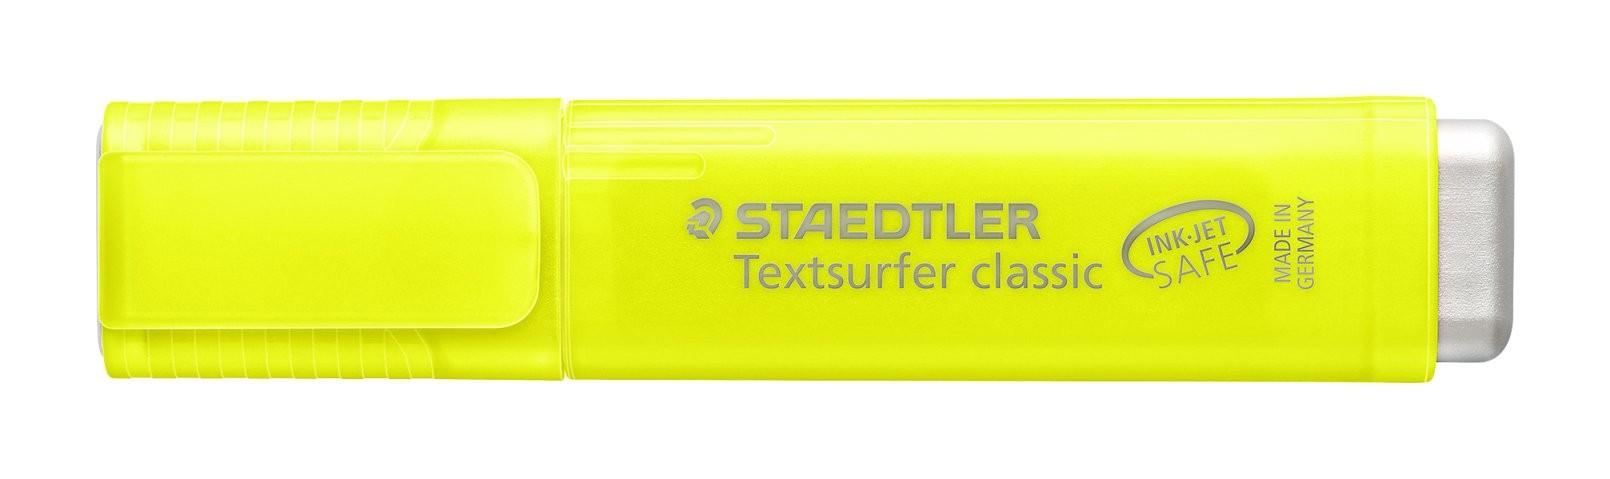 STAEDTLER Textsurfer classic - Textmarker rainbow